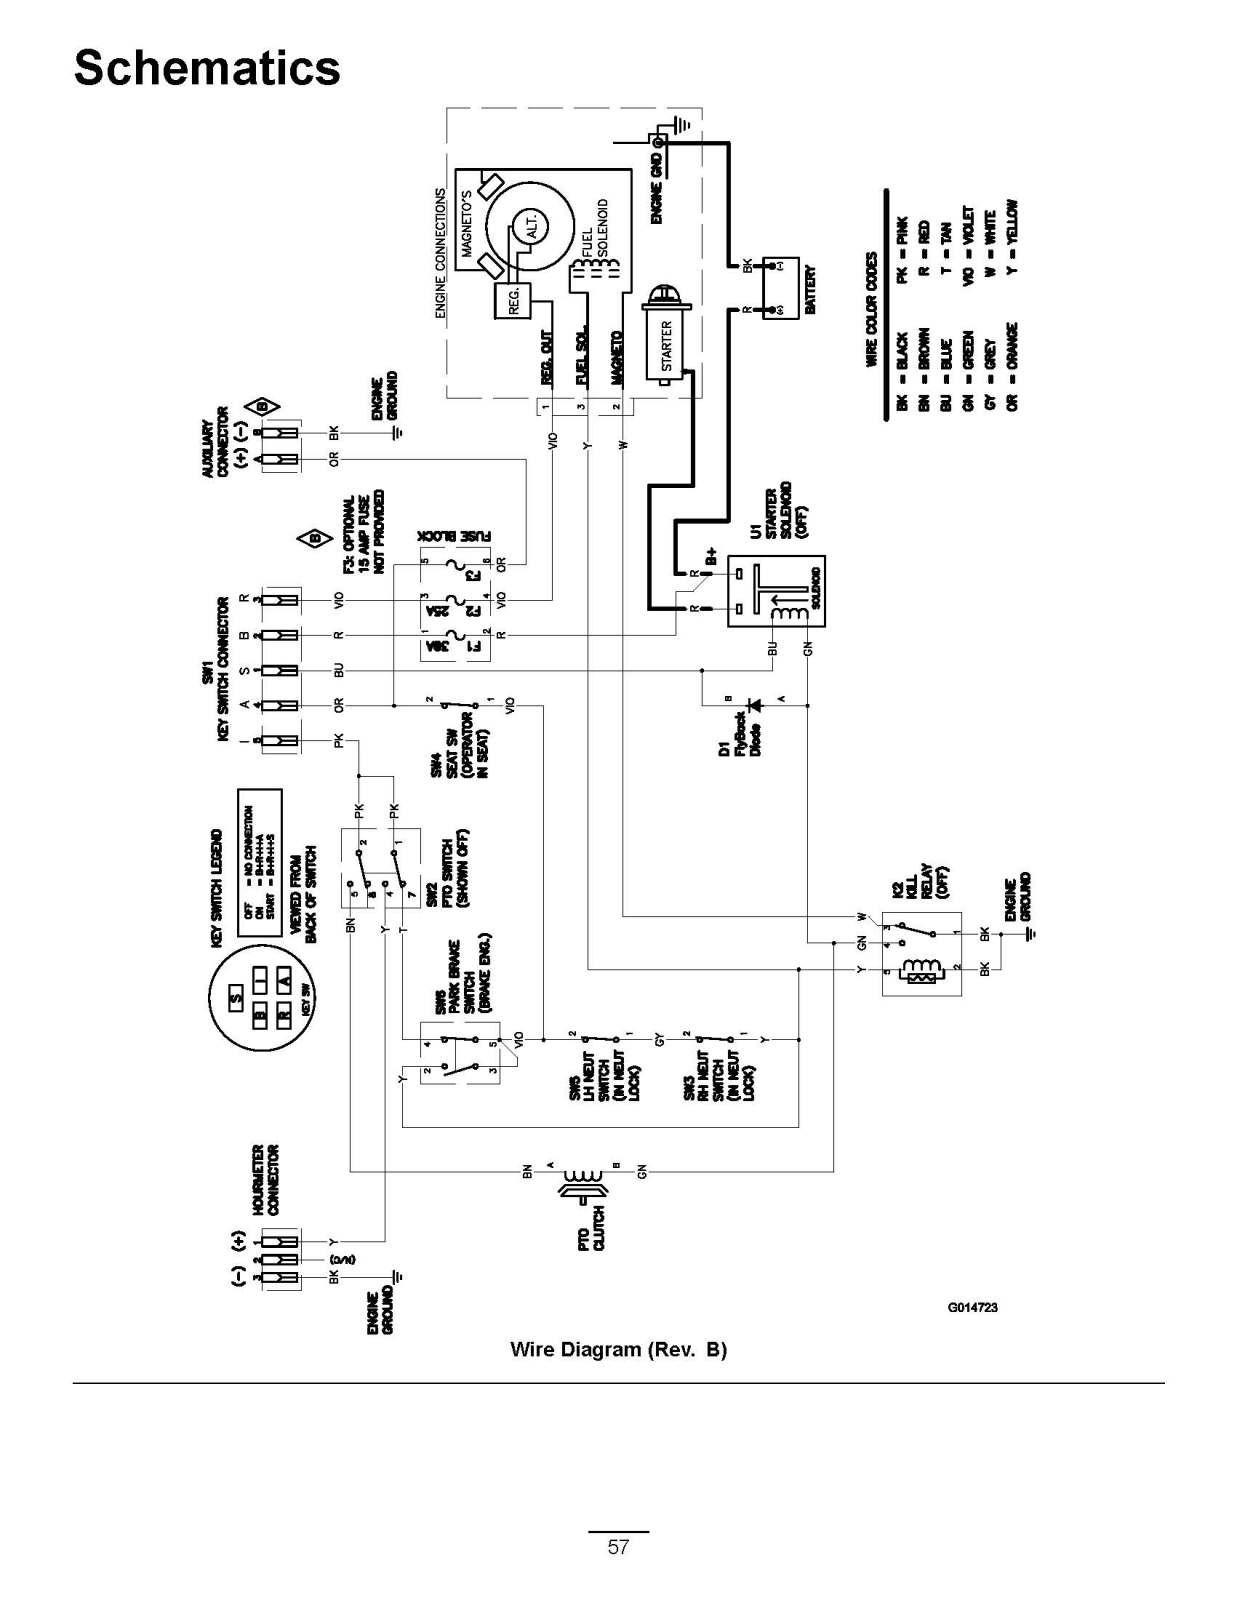 bodacious toro zero turn wiring diagram basic wiring diagram toro lx500  wiring-diagram amazing light